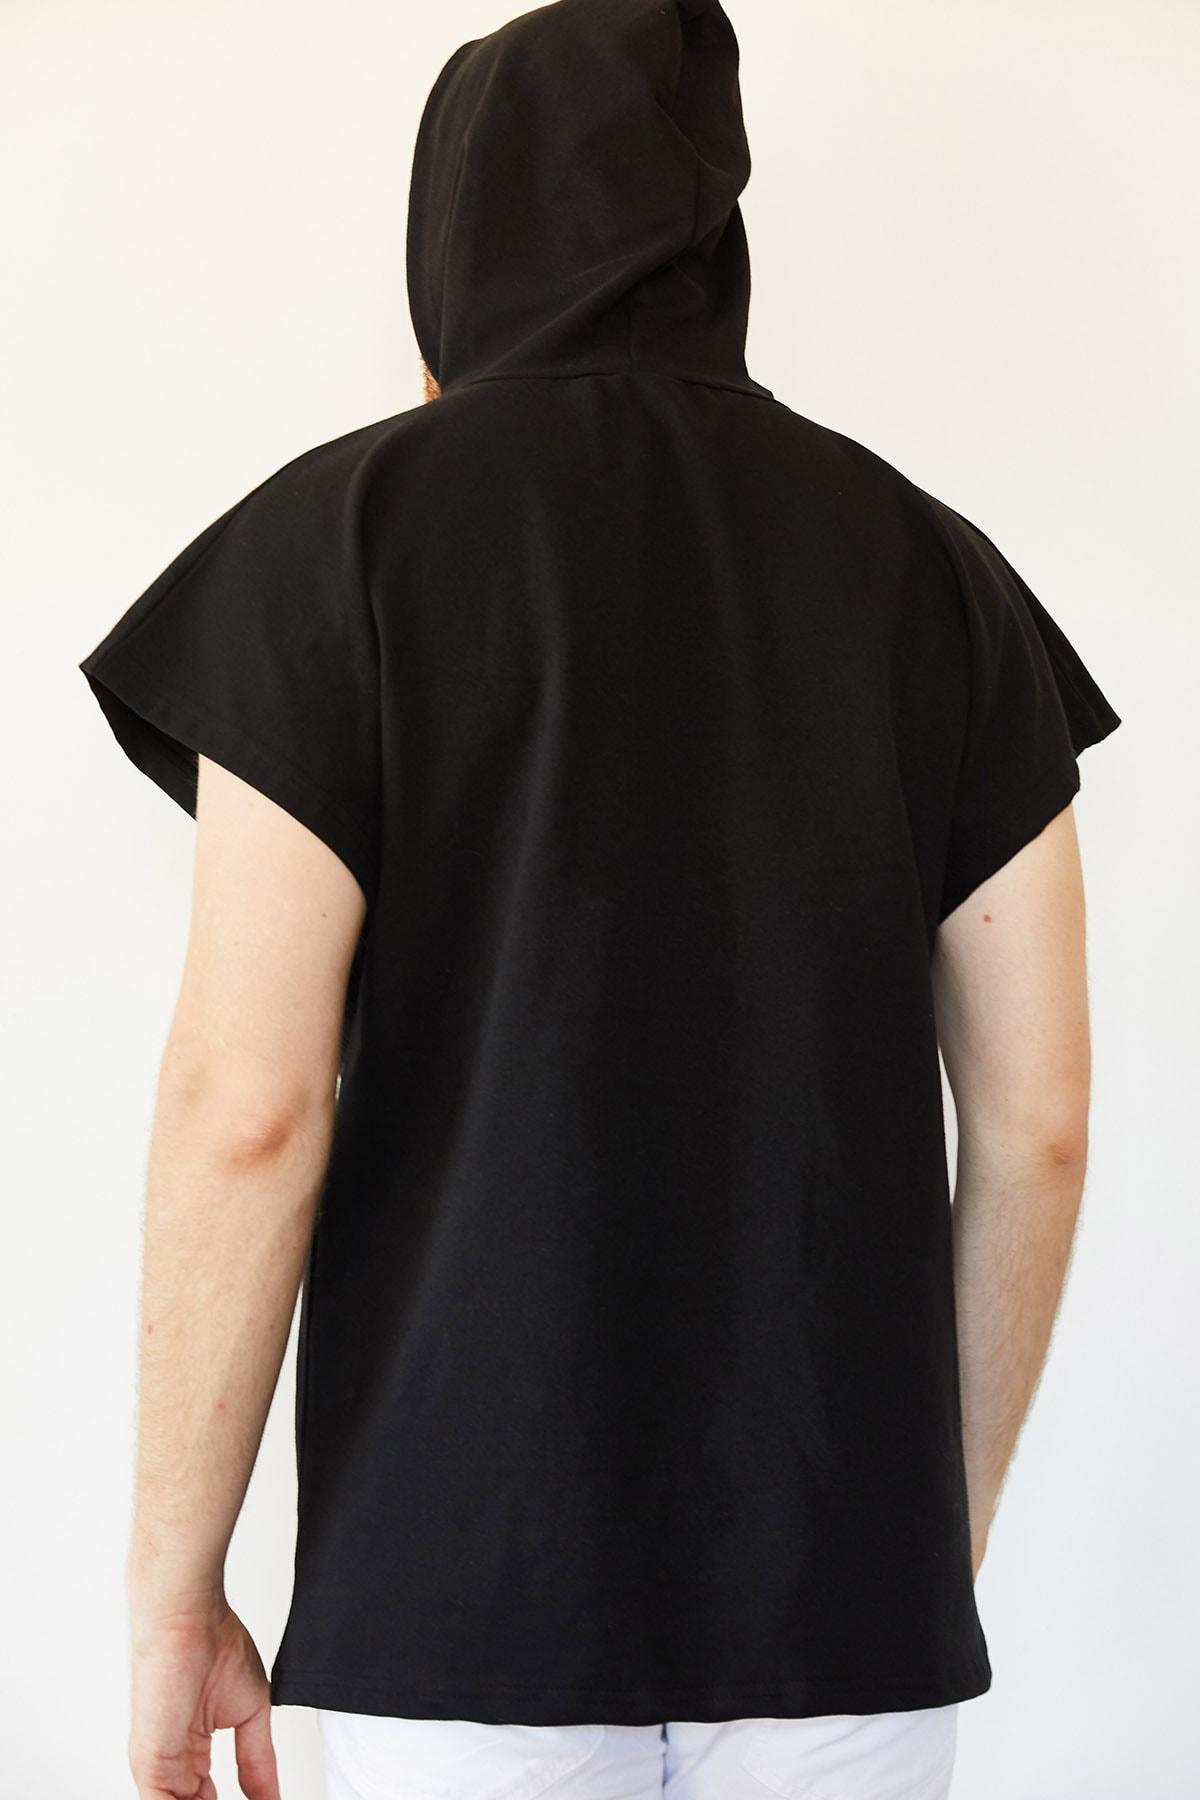 XHAN Erkek Siyah Kolsuz Sweatshirt 0yxe8-44068-02 2